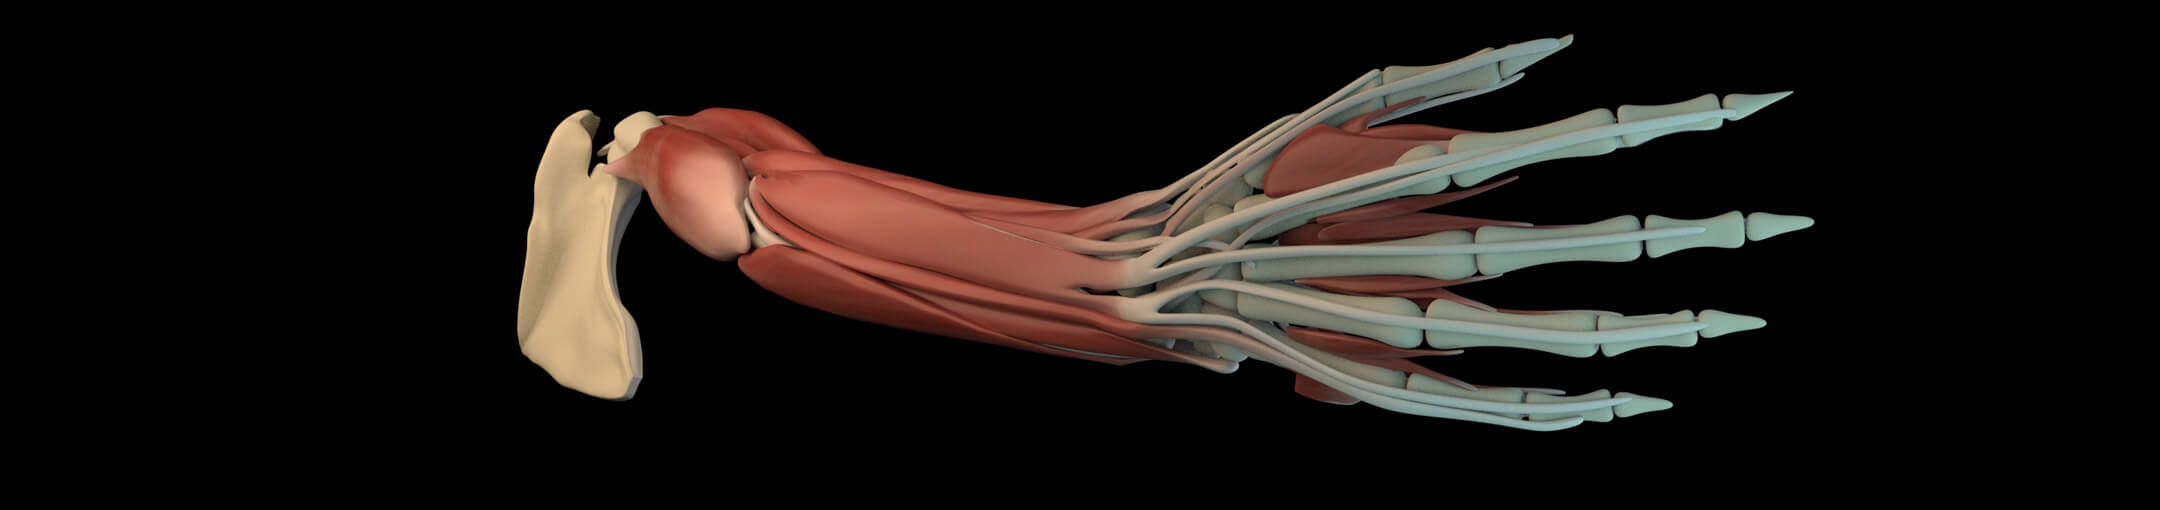 Medical Illustration BFA | Rochester Institute of Technology